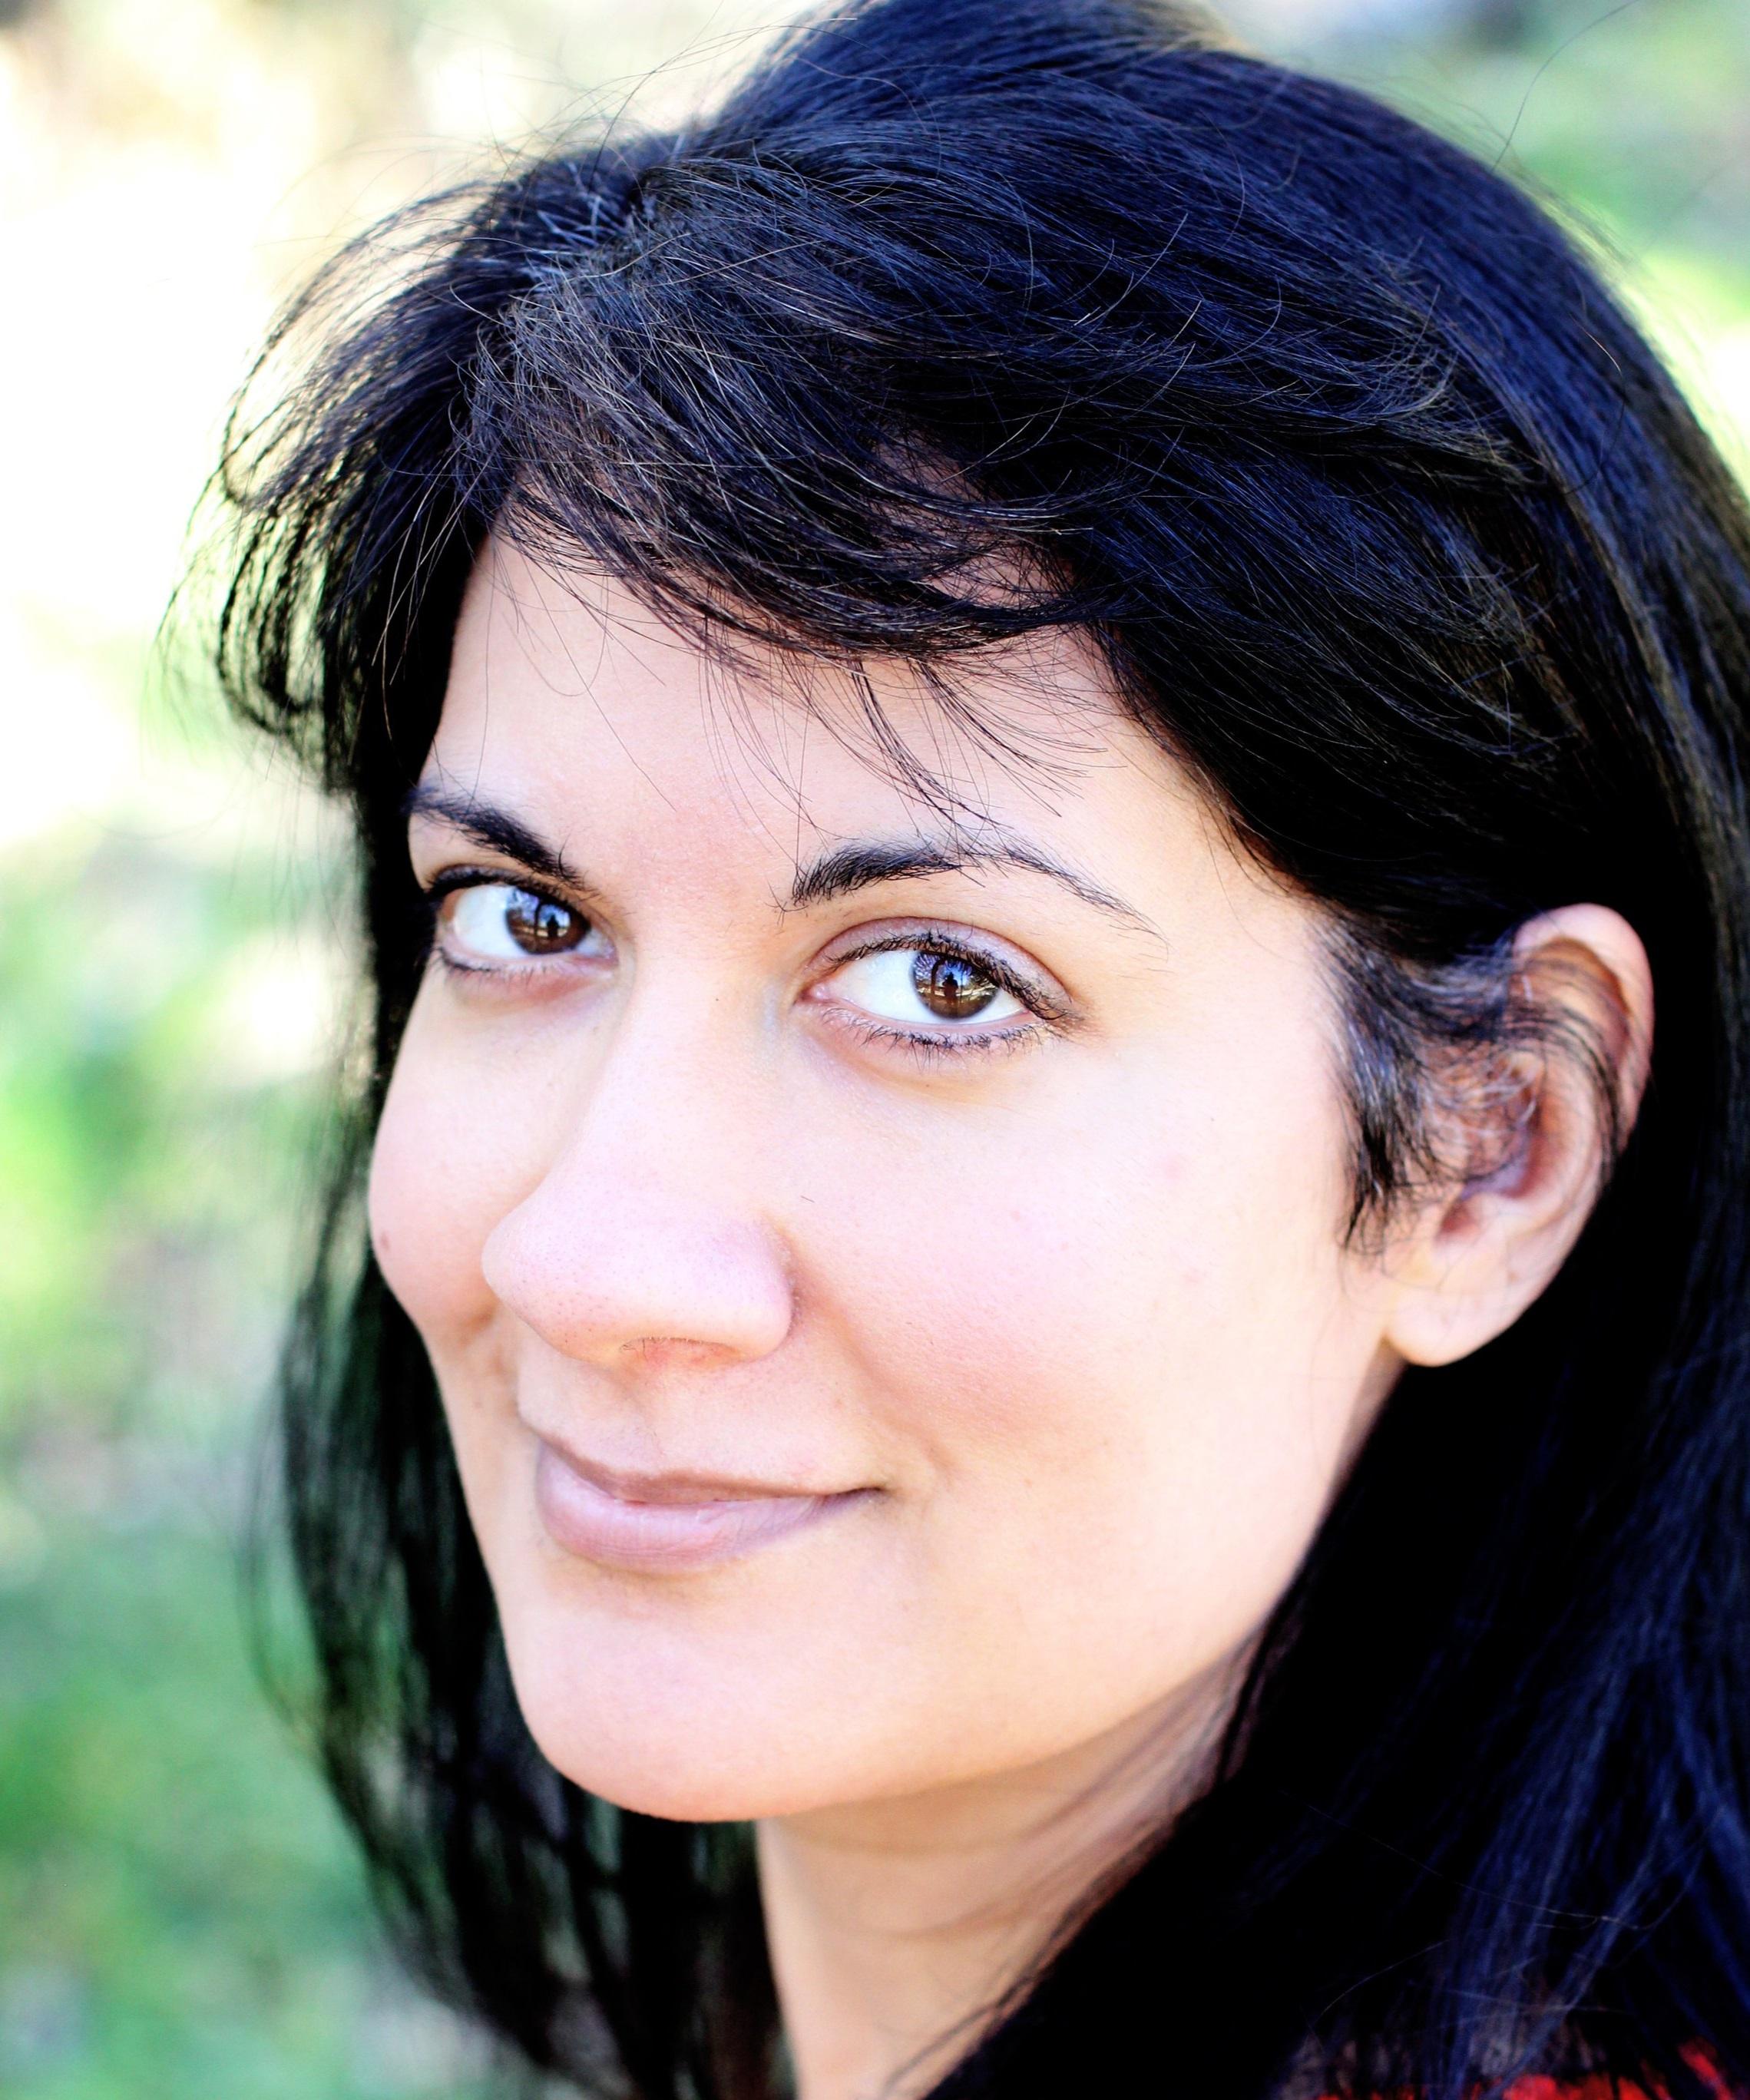 Twitter:  @salimaalikhan  • Facebook:  Salima Alikhan  • LinkedIn:  Salima Alikhan  • Website:    salimaalikhan.net